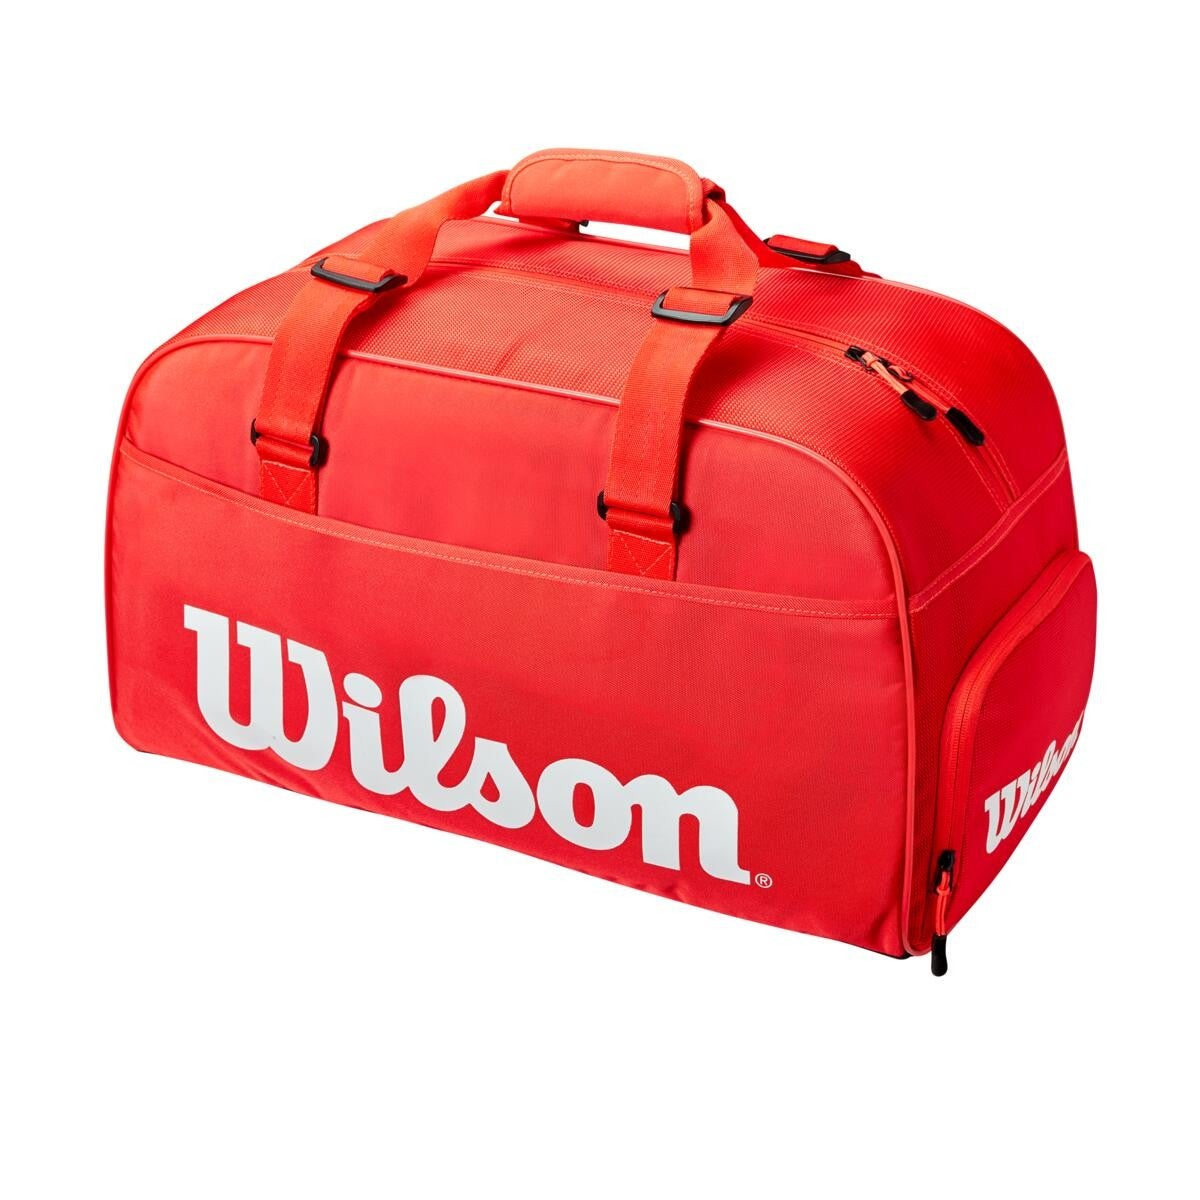 Bolsa Wilson Super Tour Small Duffle Vermelha